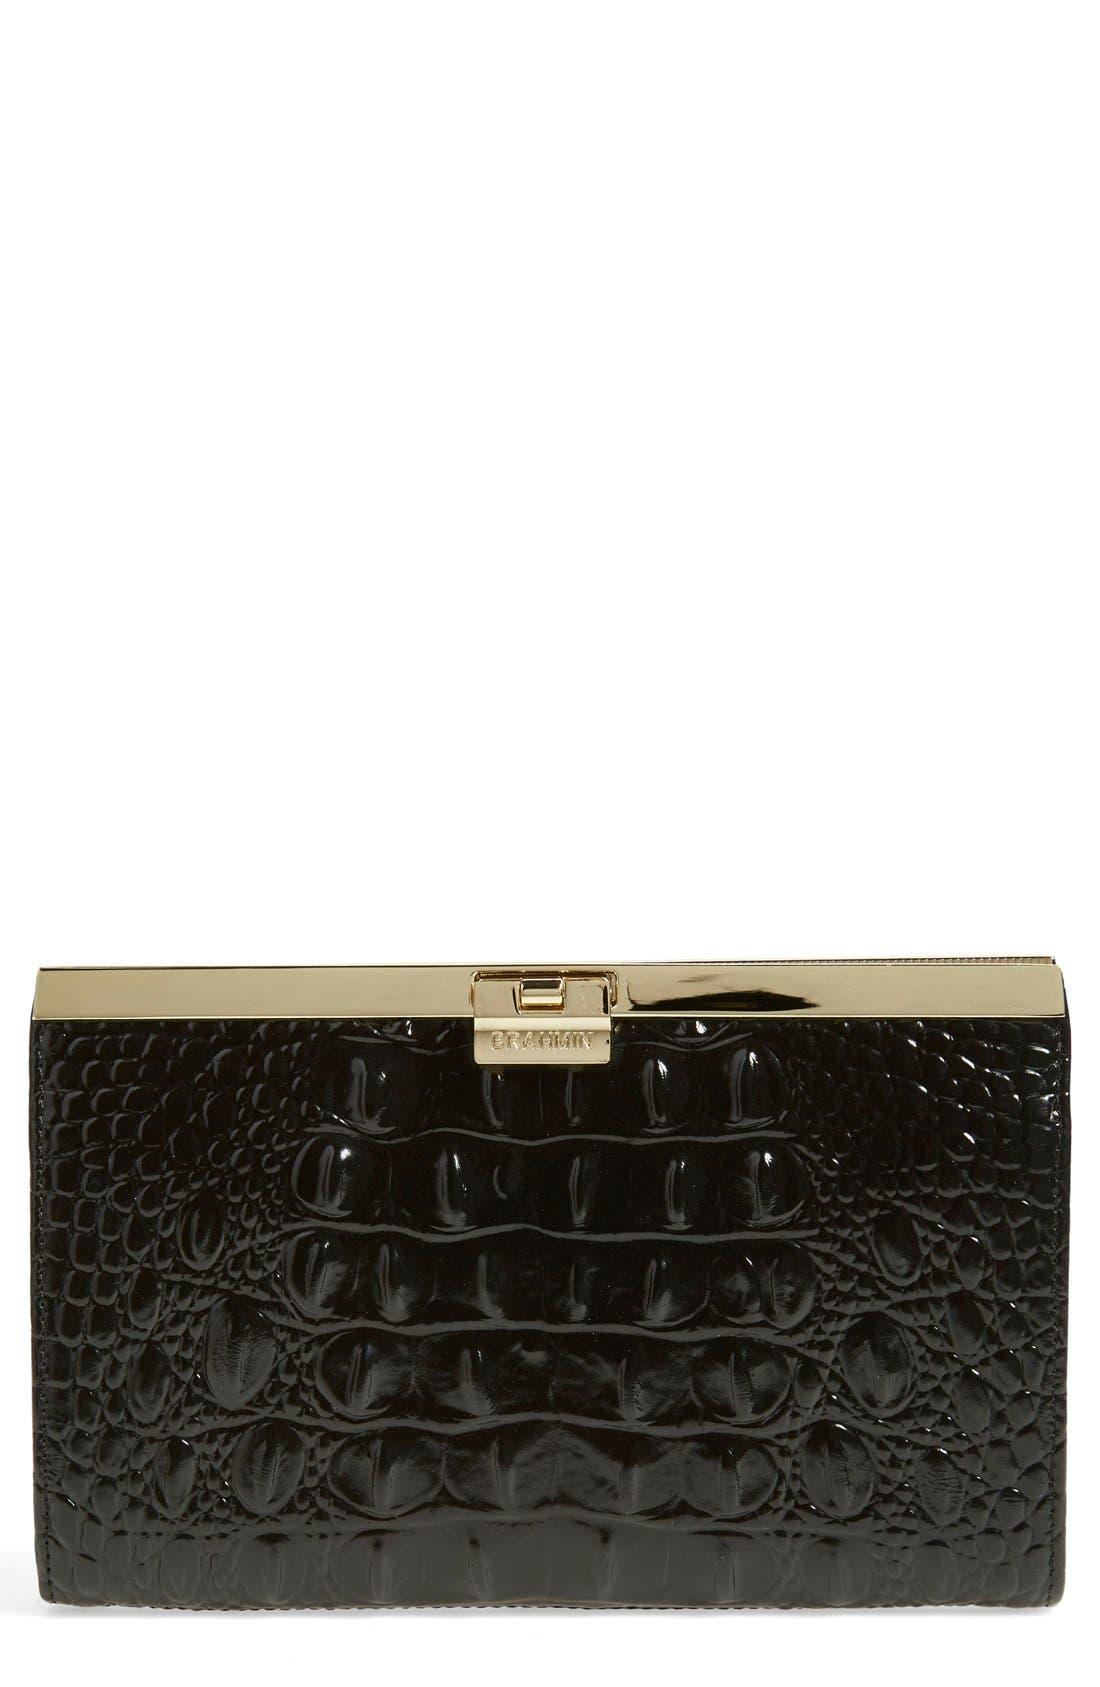 'Tillie' Croc Embossed Leather Clutch,                             Main thumbnail 1, color,                             Onyx